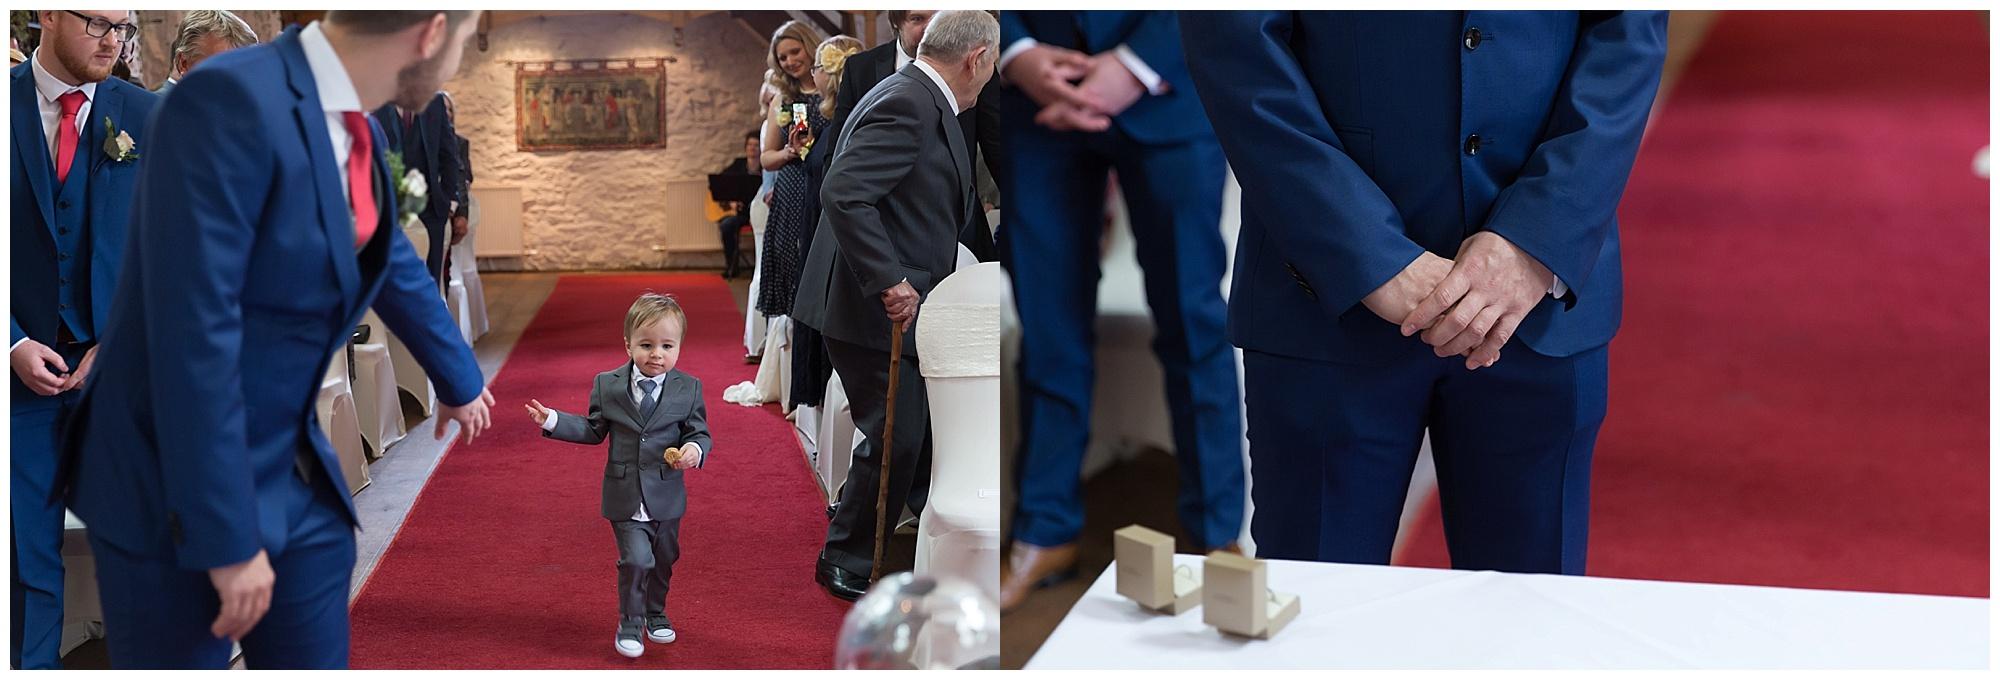 pageboy at a wedding